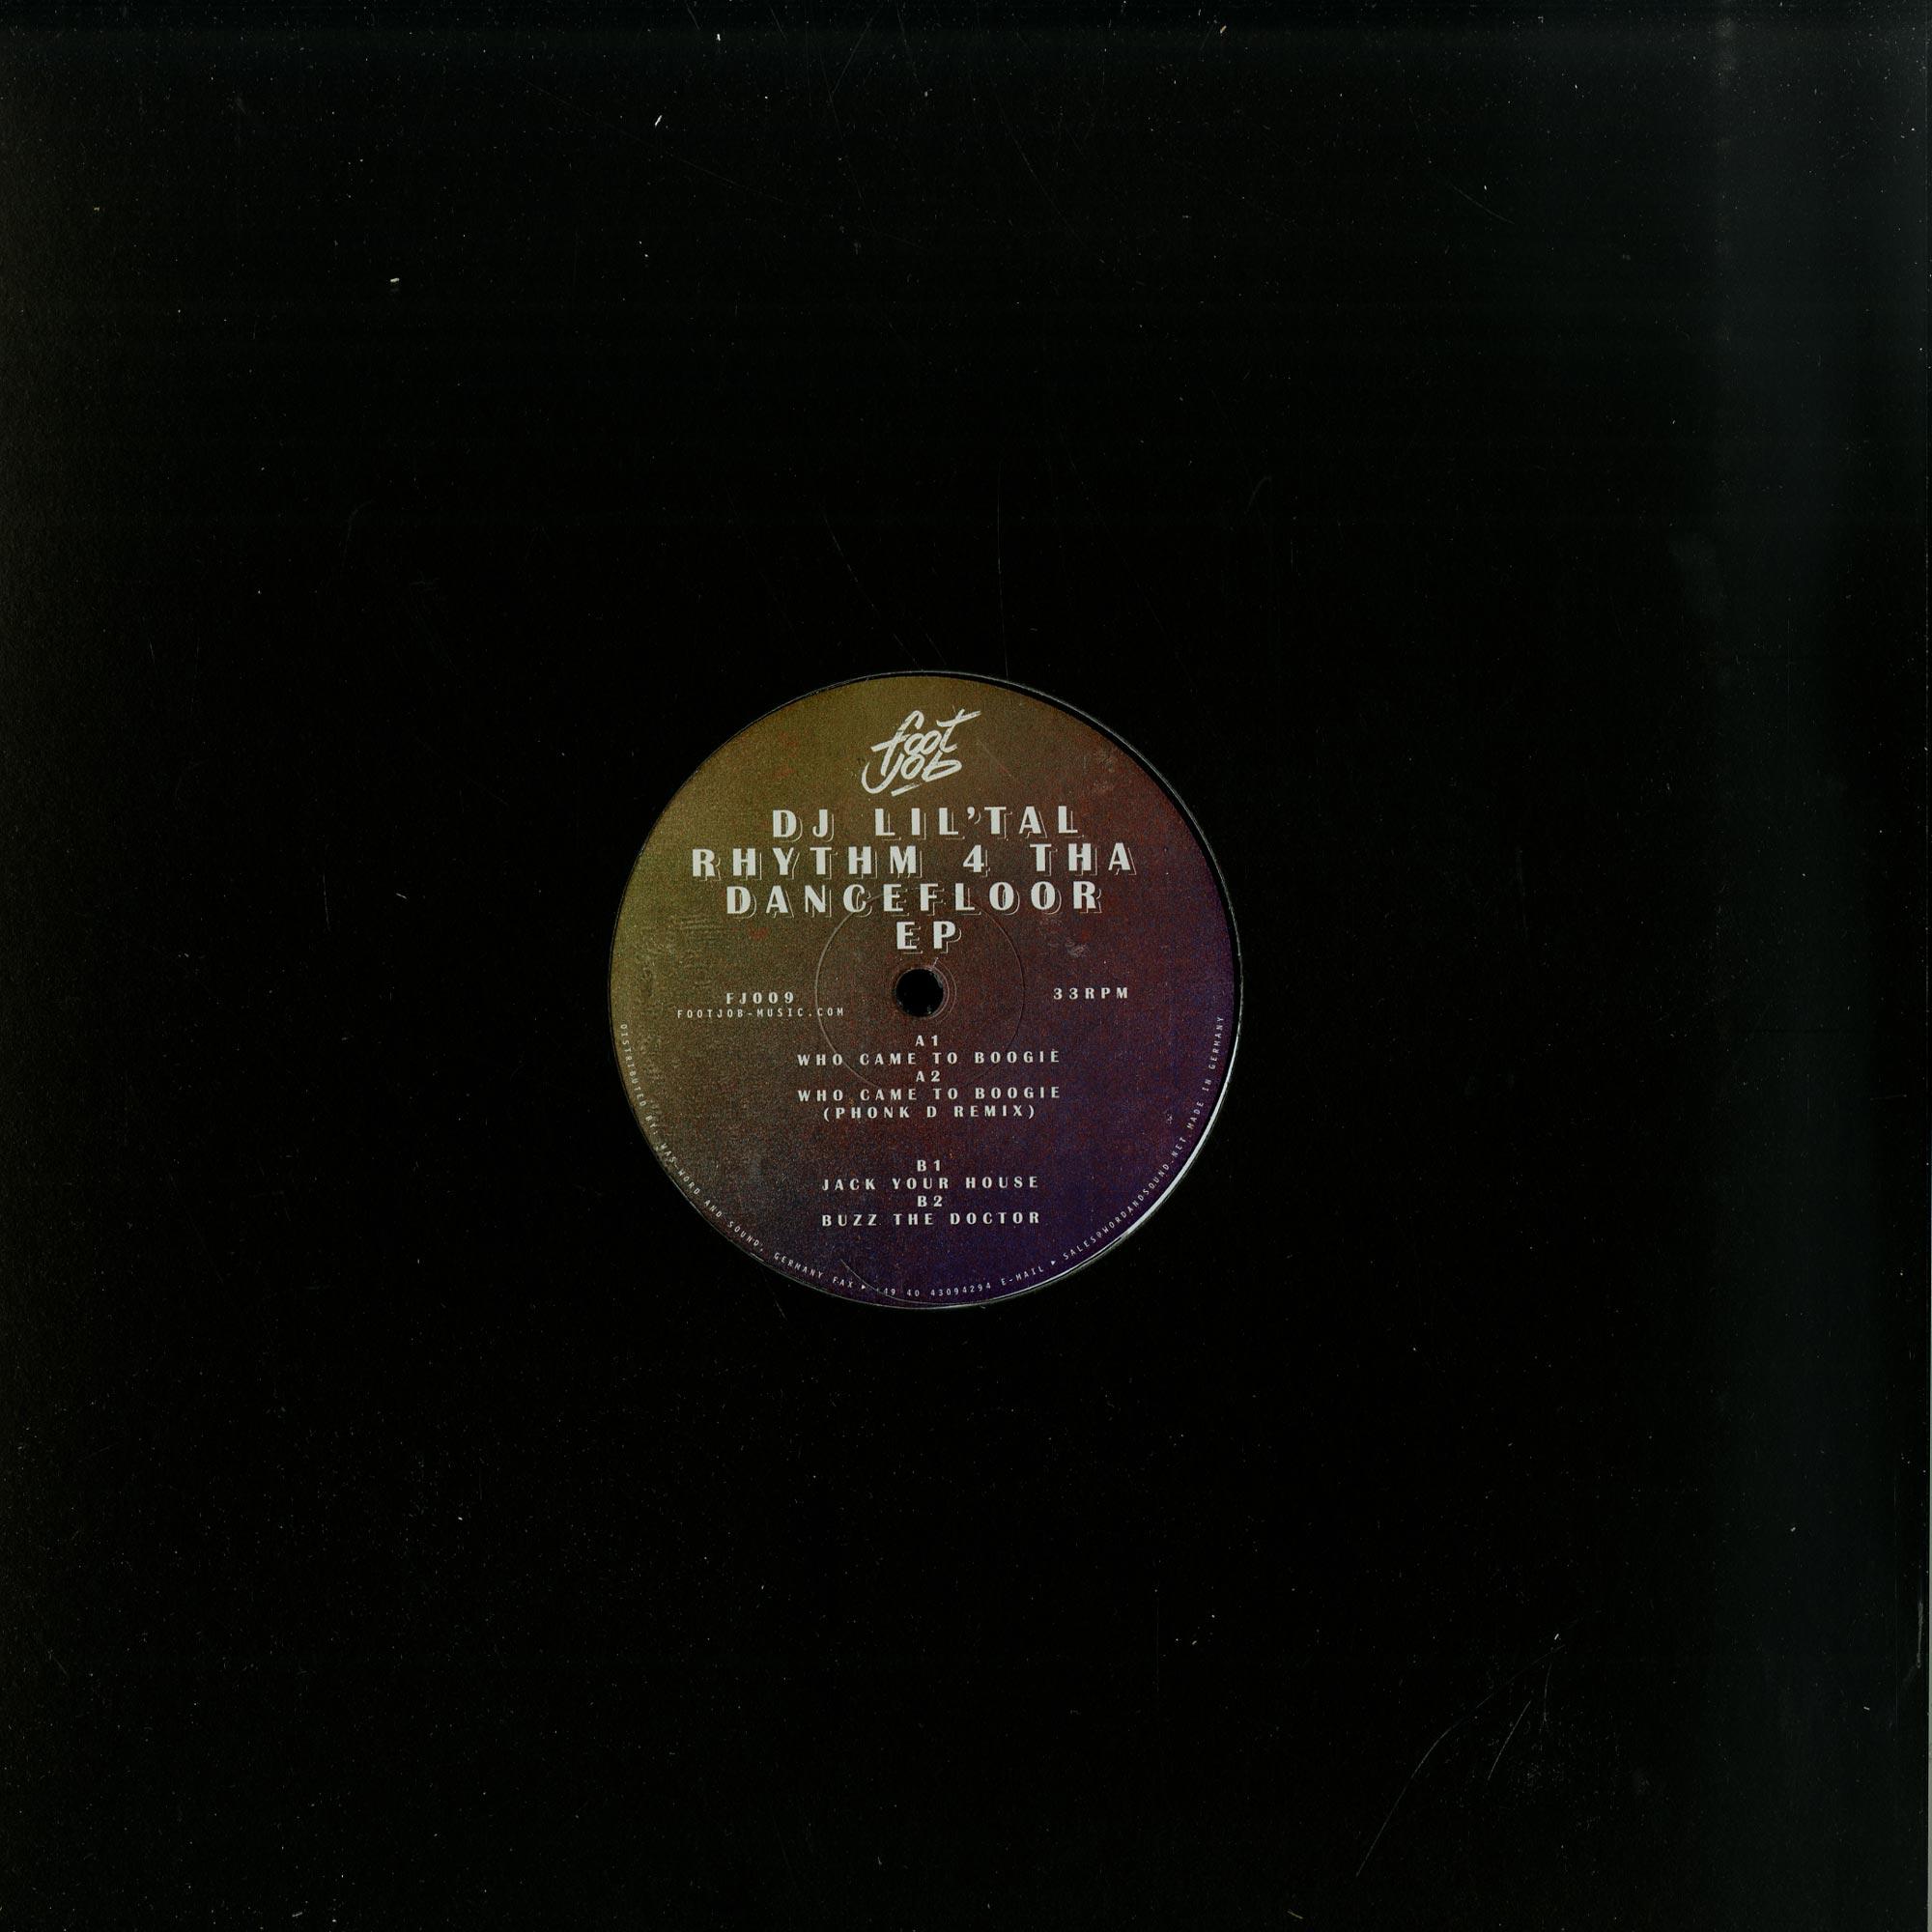 DJ Lil Tal - RHYTHM 4 THA DANCEFLOOR EP, PHONK D RMX